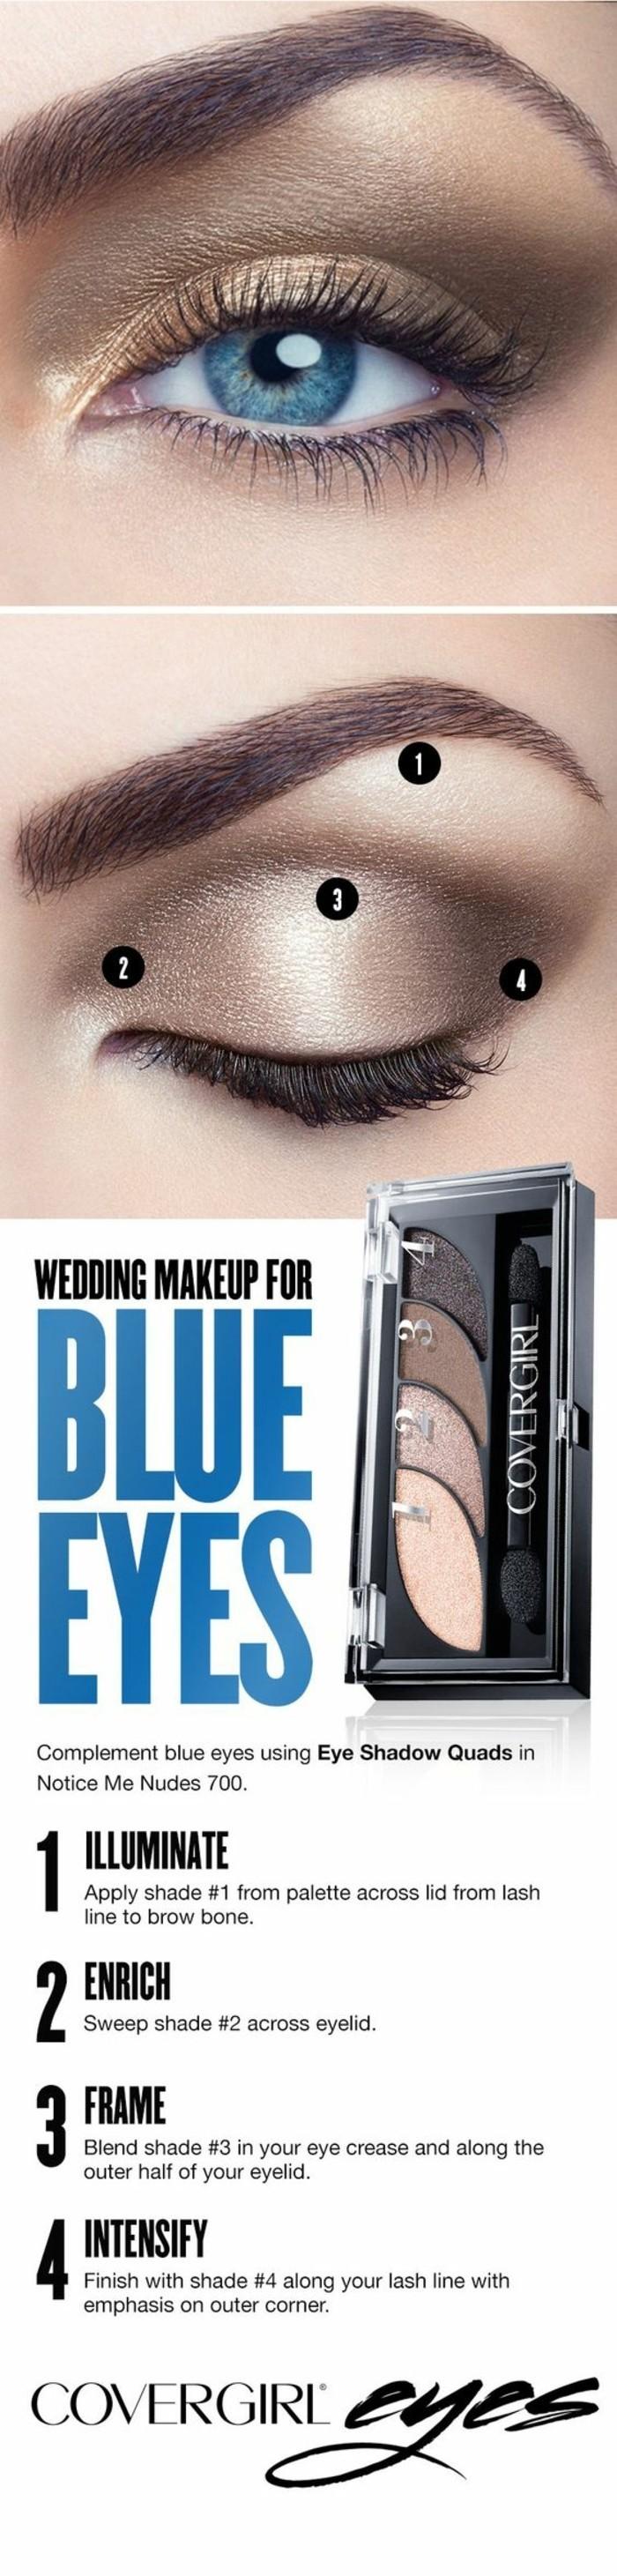 00-covergirl-proposition-pour-maquiller-les-yeux-bleus-comment-maquiller-les-yeux-bleus